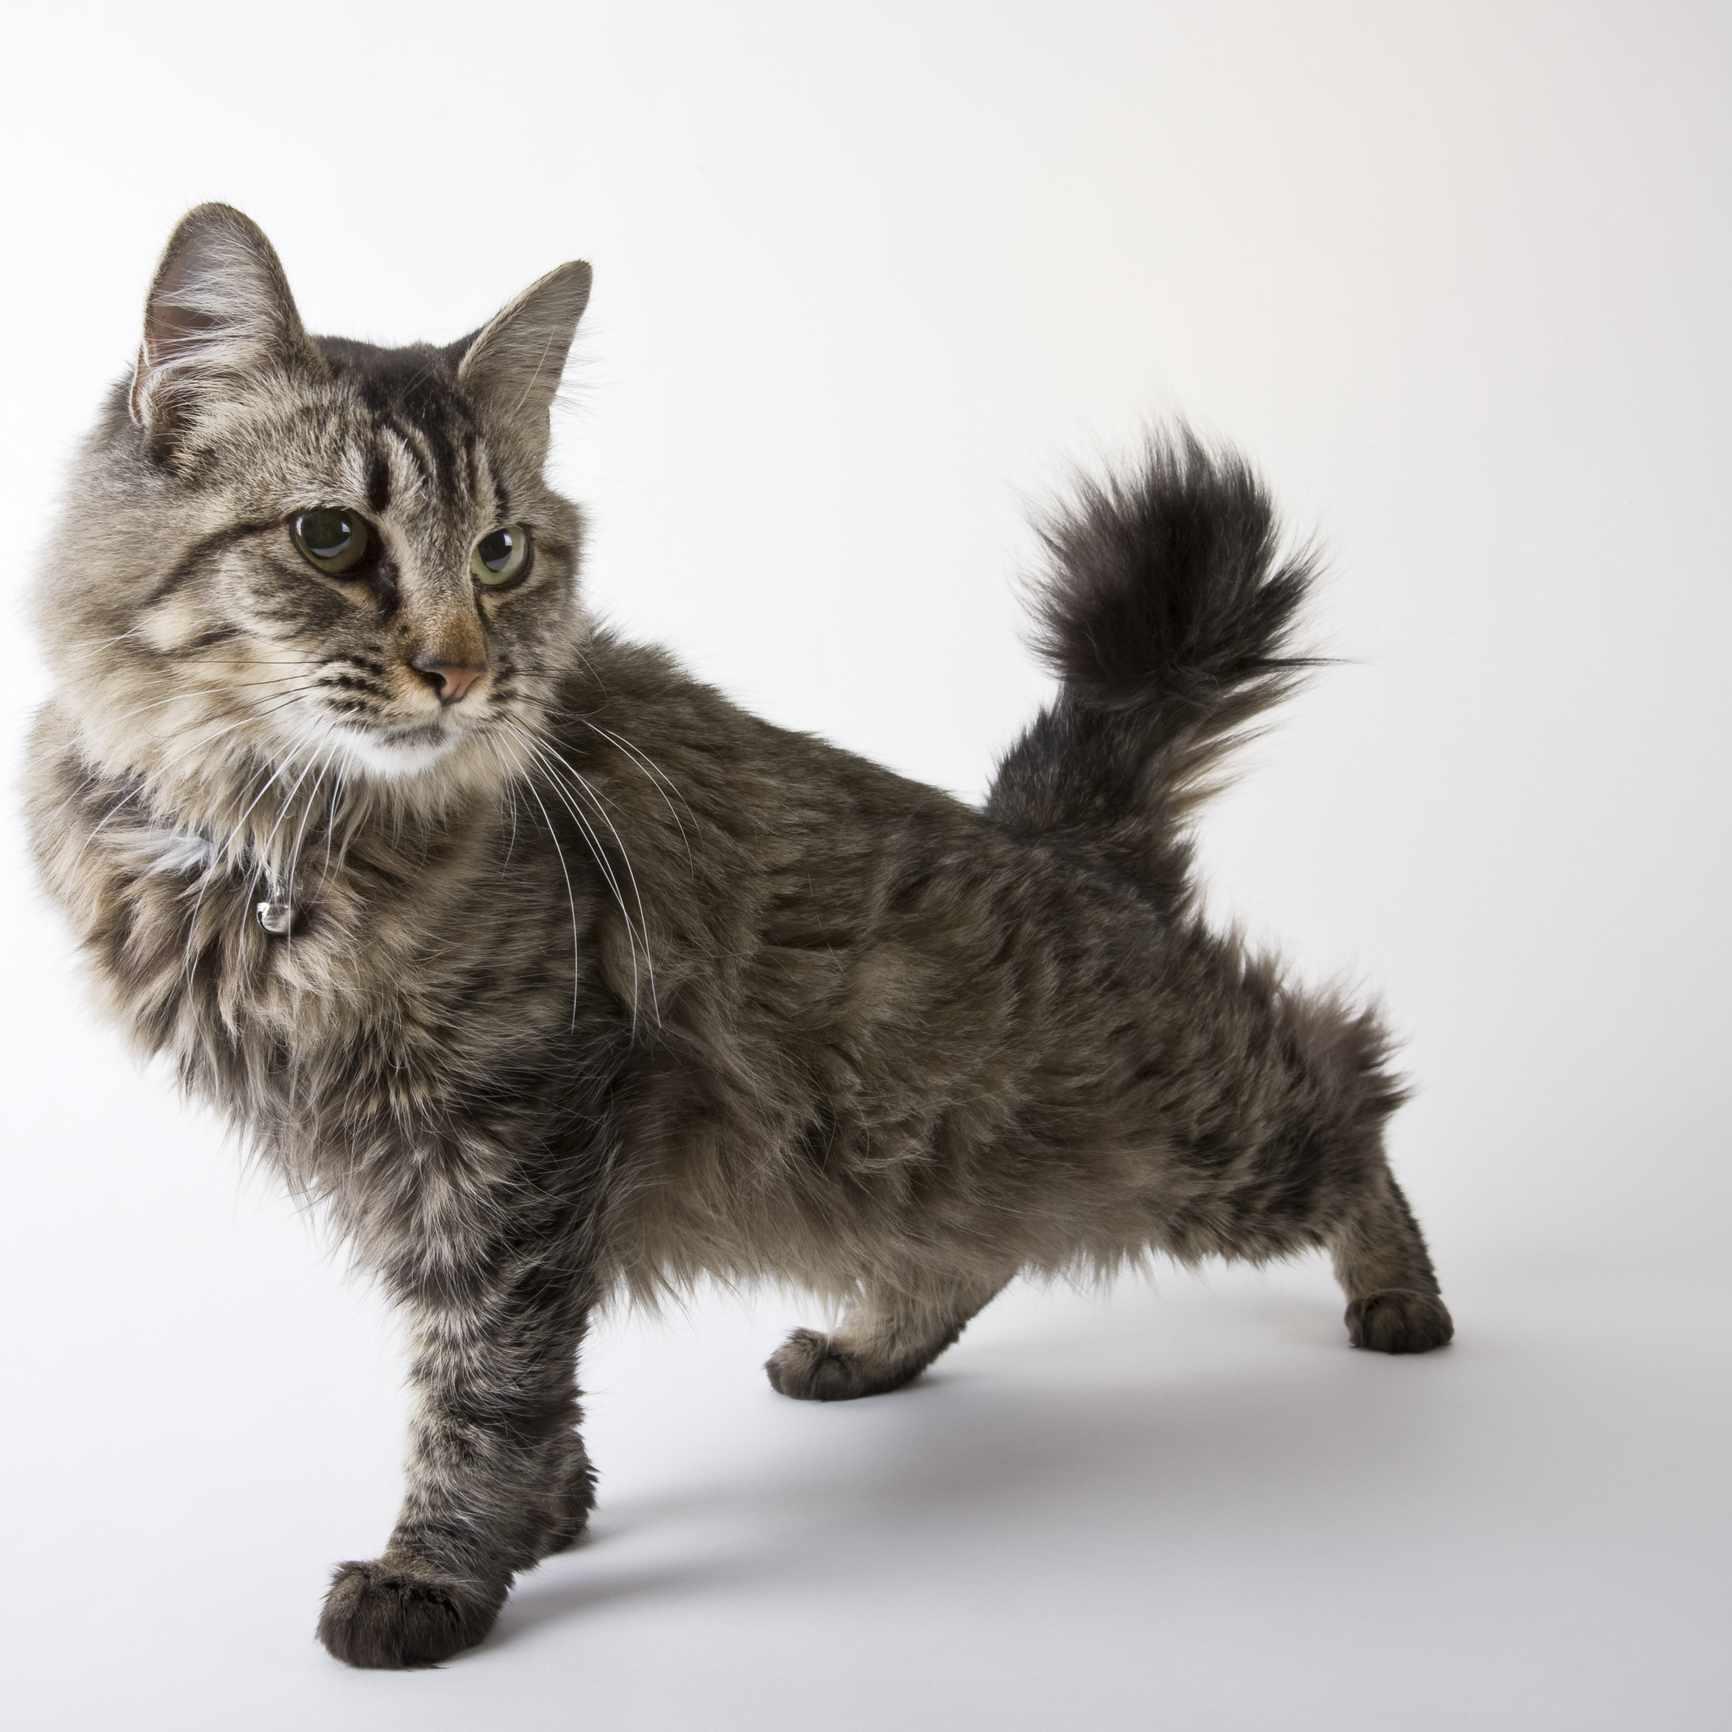 Retrato de raza de gato bobtail americano